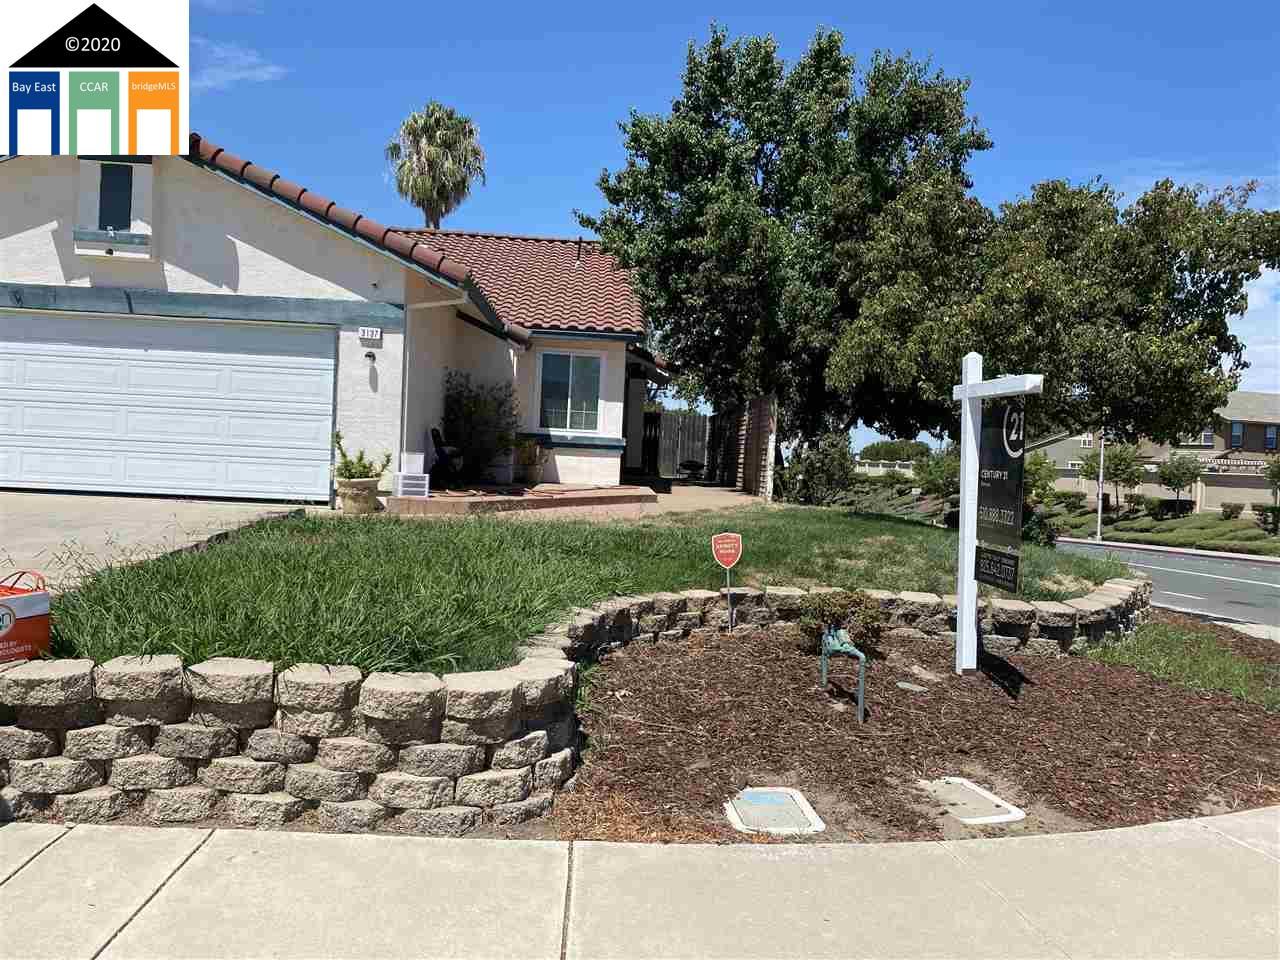 3137 Almondridge Dr, ANTIOCH, CA 94509